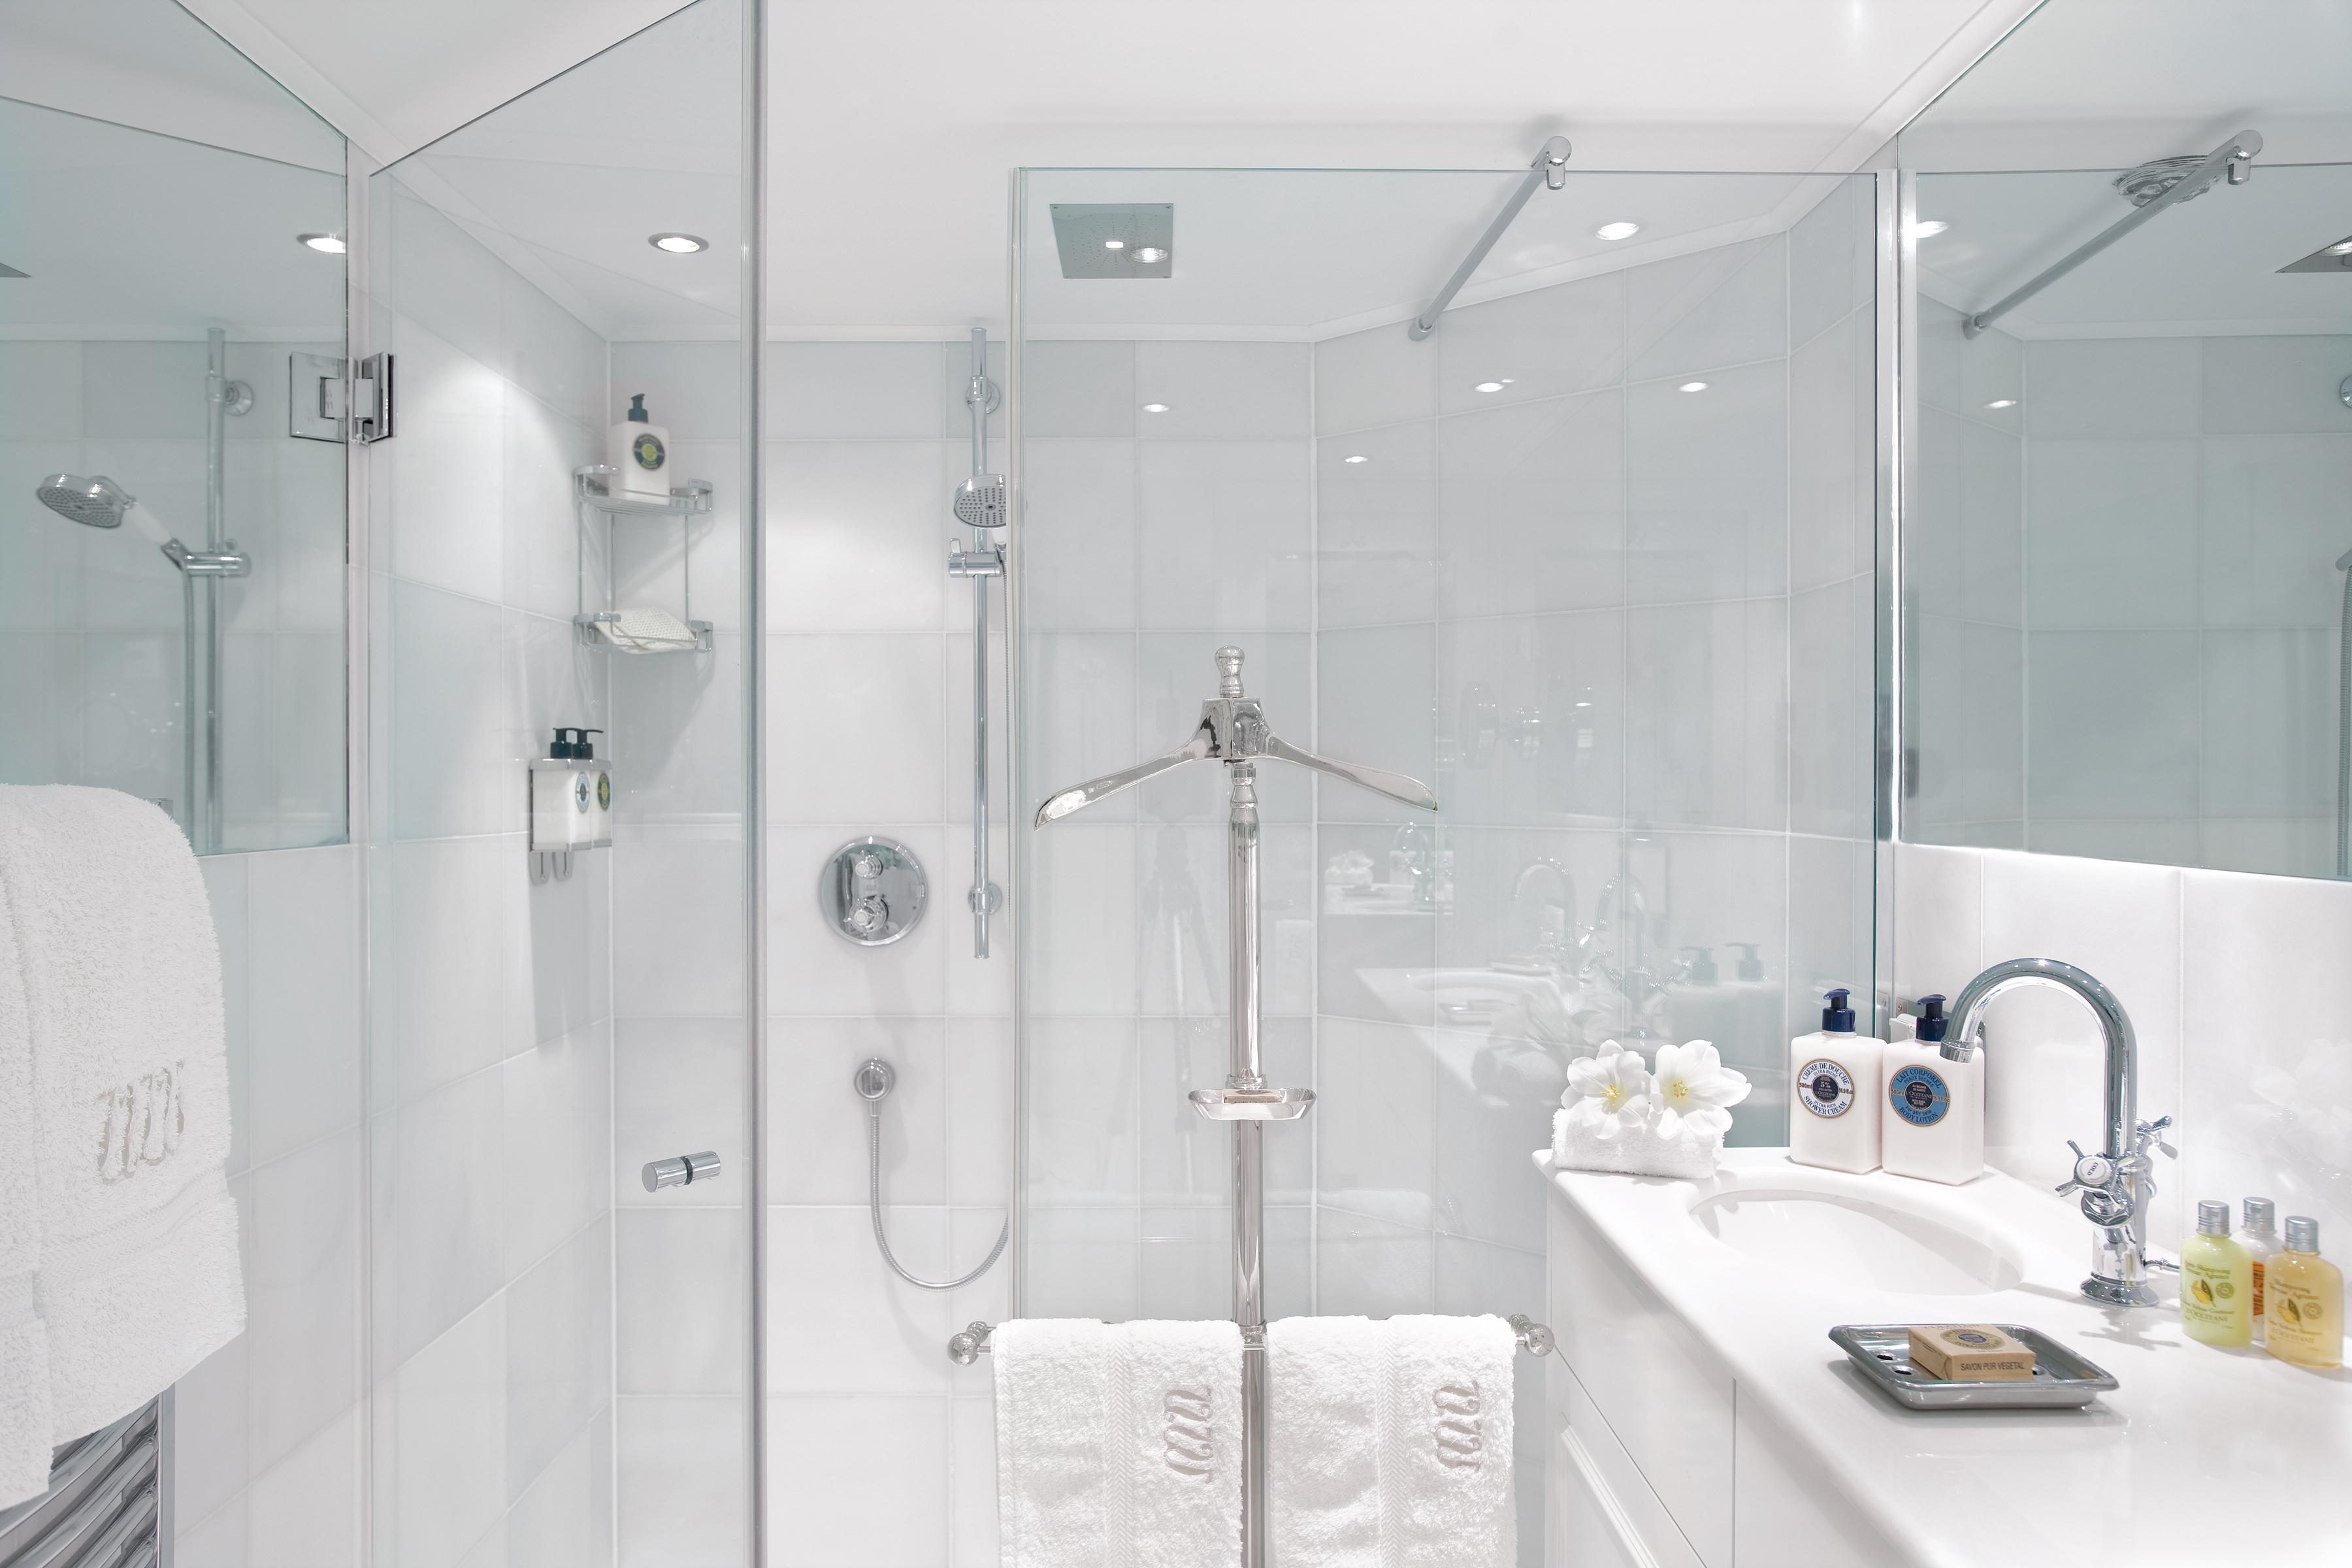 UNIWORLD Boutique River Cruises River Queen Accommodation Suite Bathroom.jpg